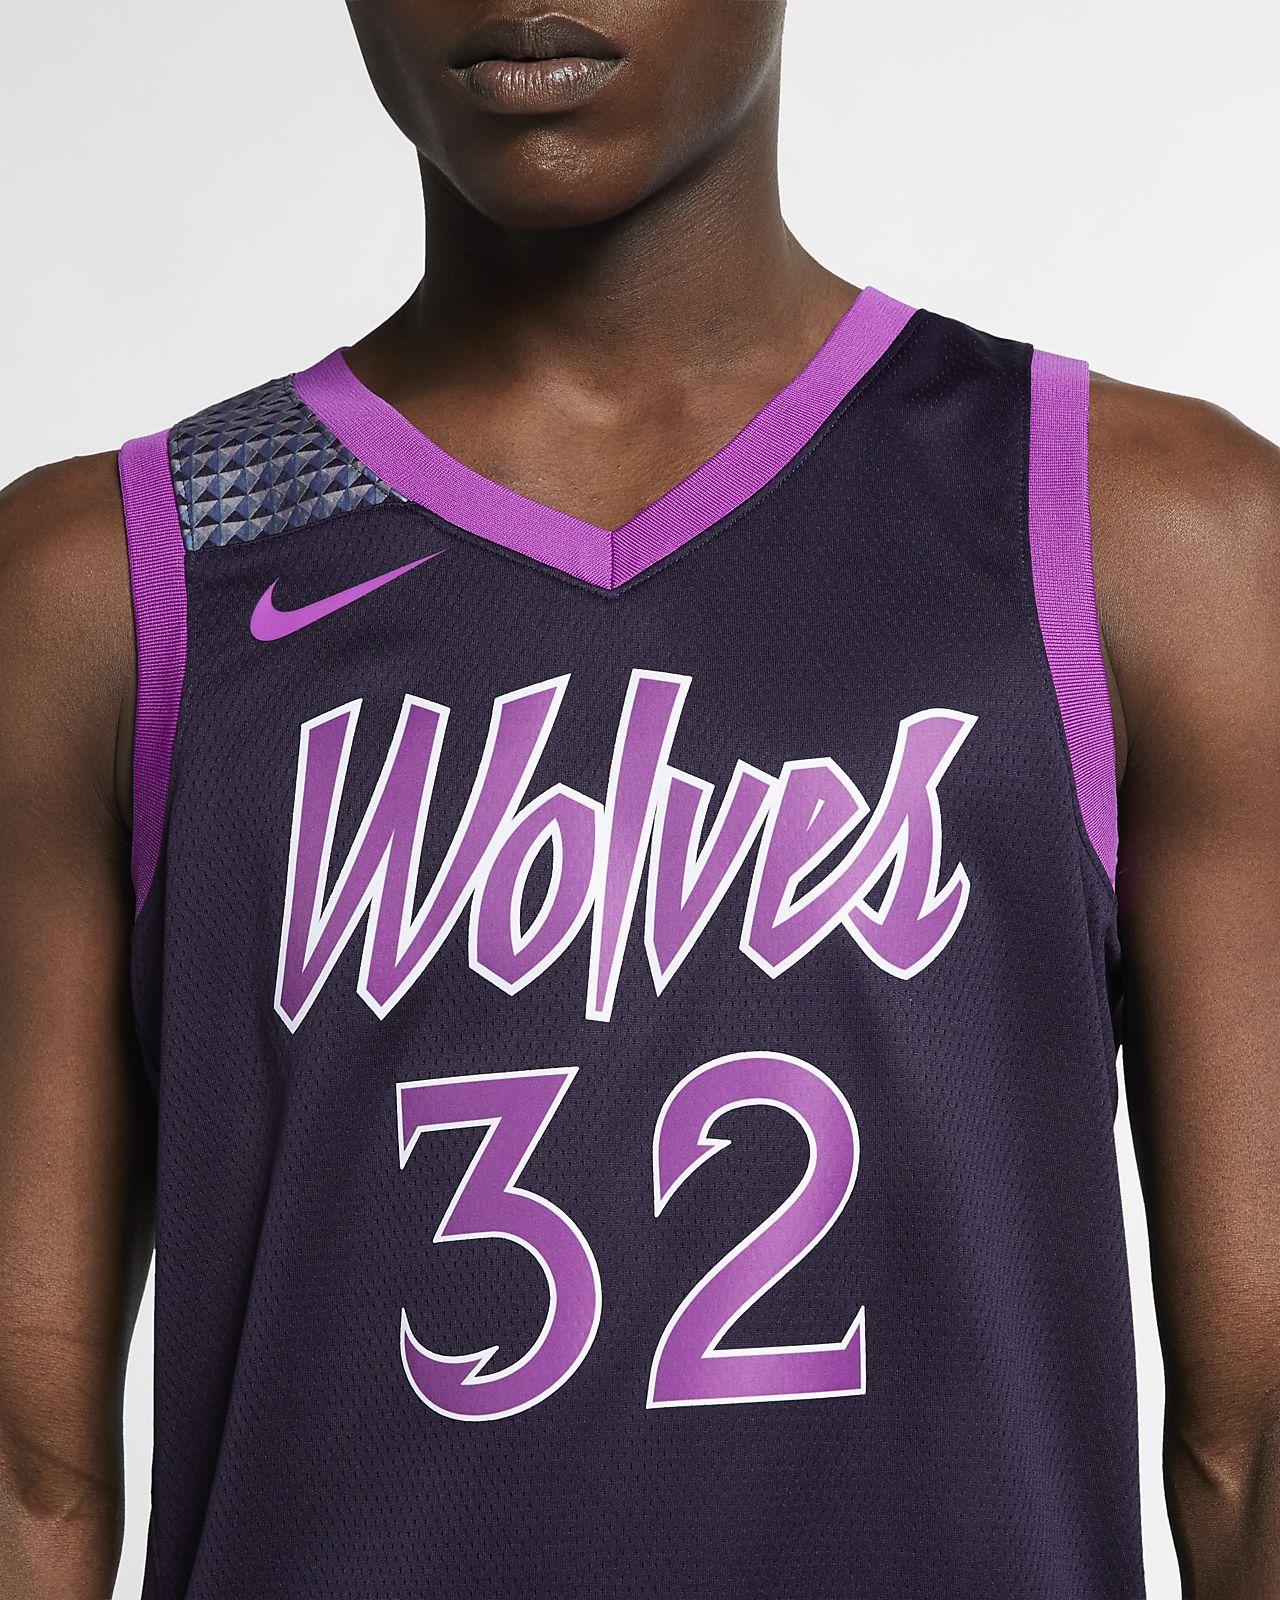 9b686205d274 ... Karl-Anthony Towns City Edition Swingman (Minnesota Timberwolves) Men s  Nike NBA Connected Jersey